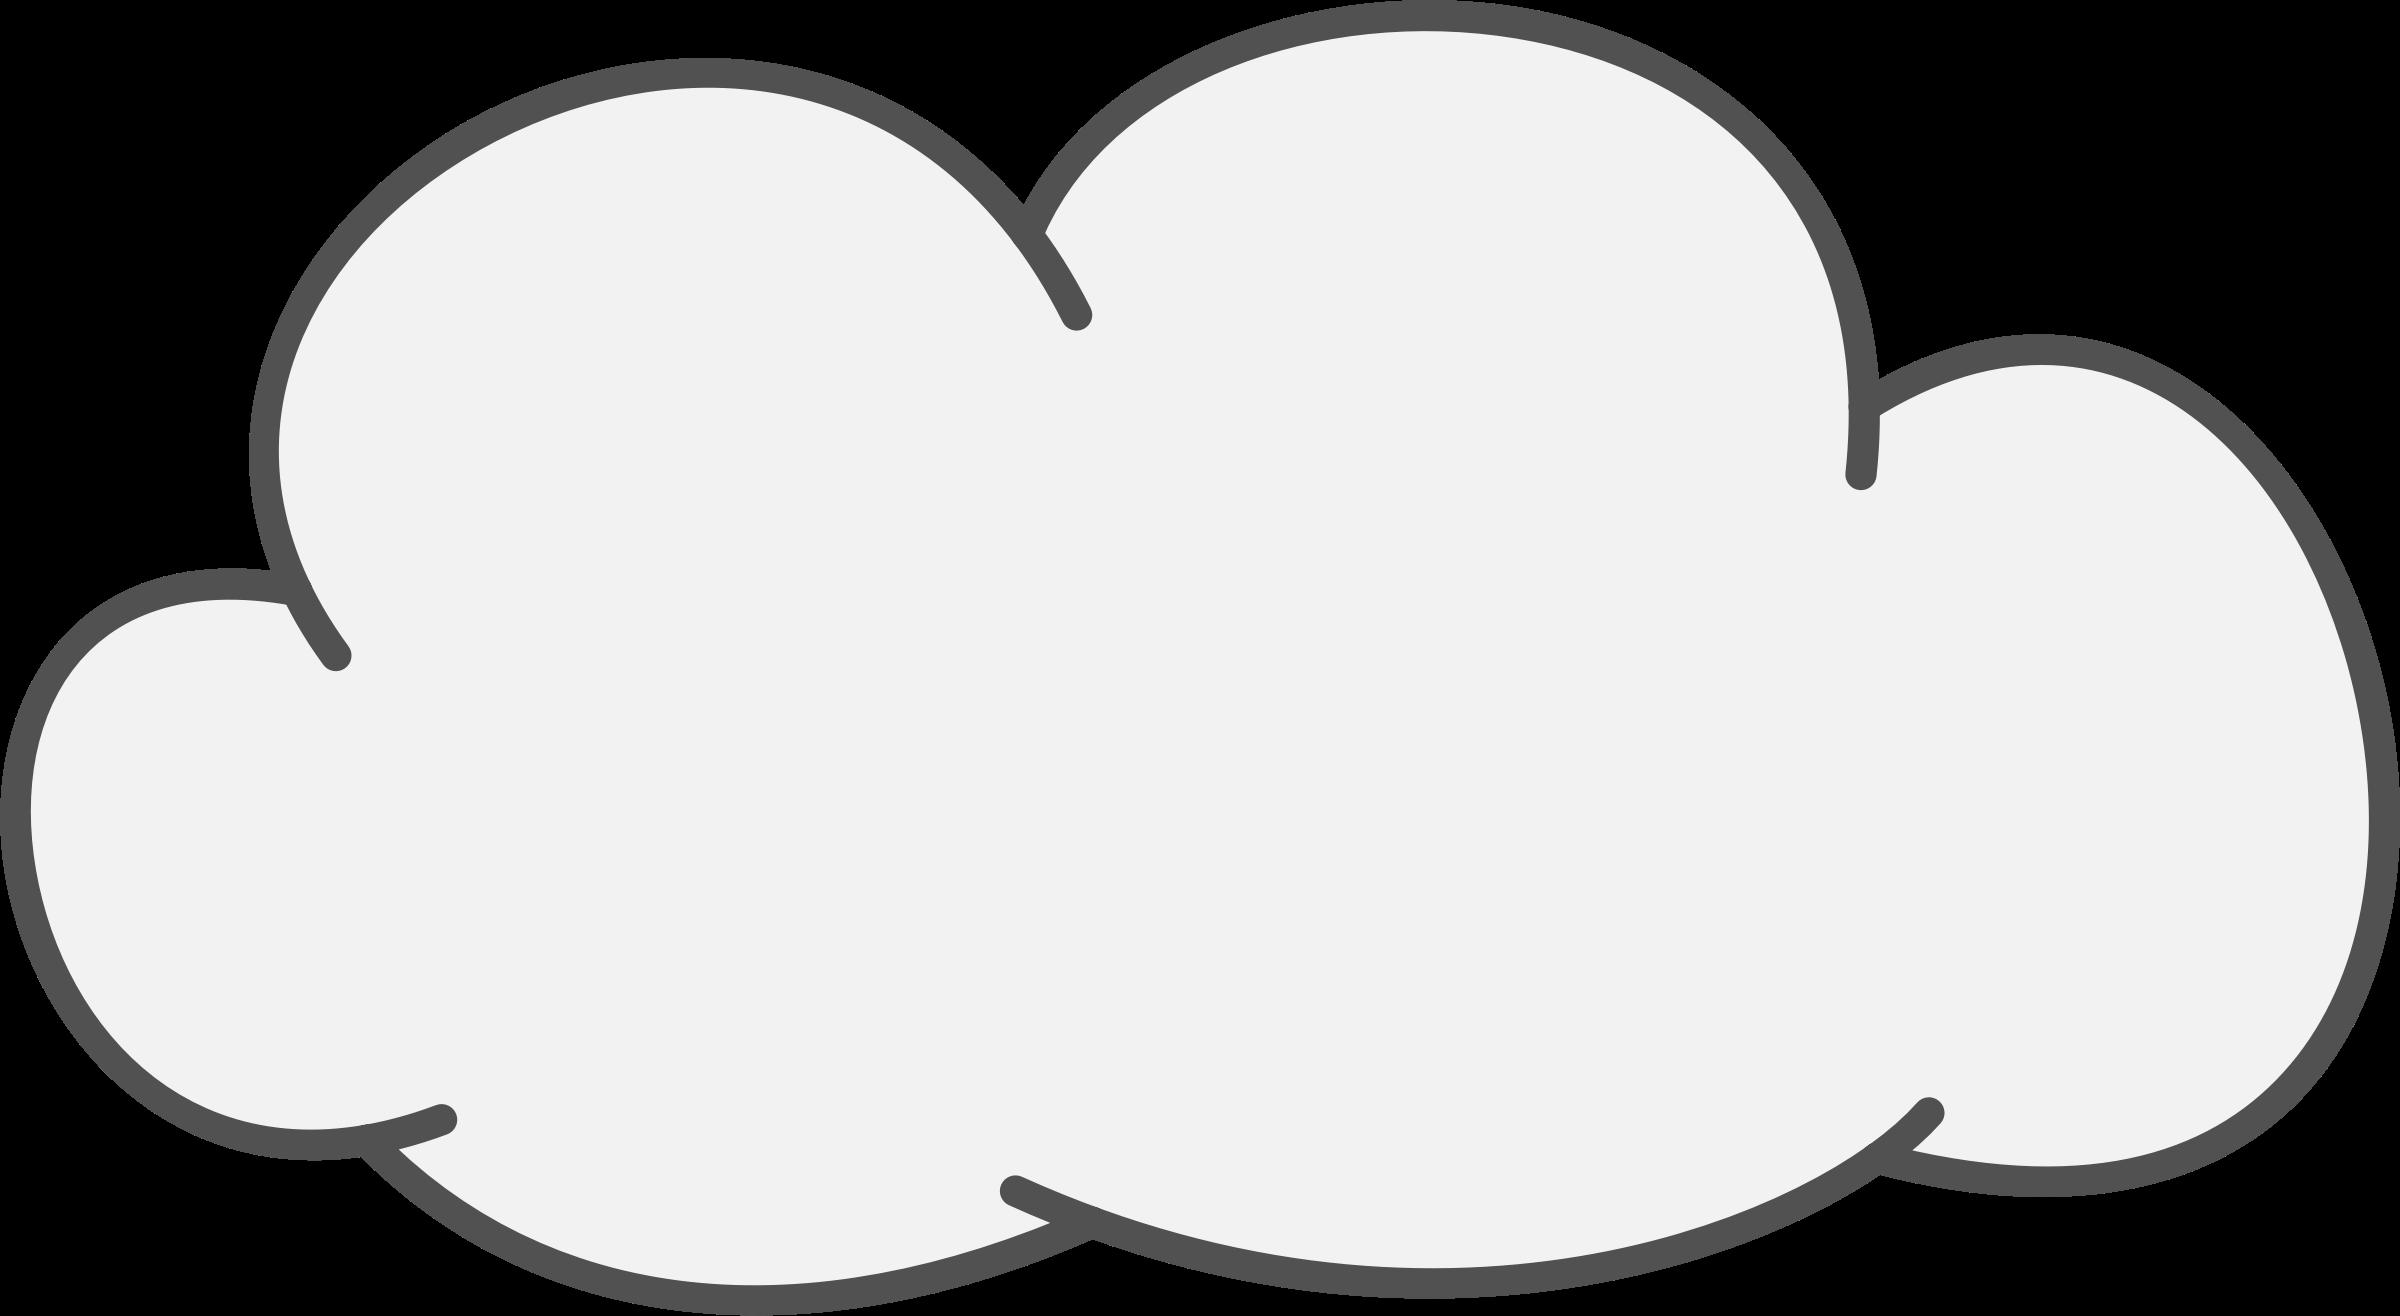 Clouds clipart transparent background.